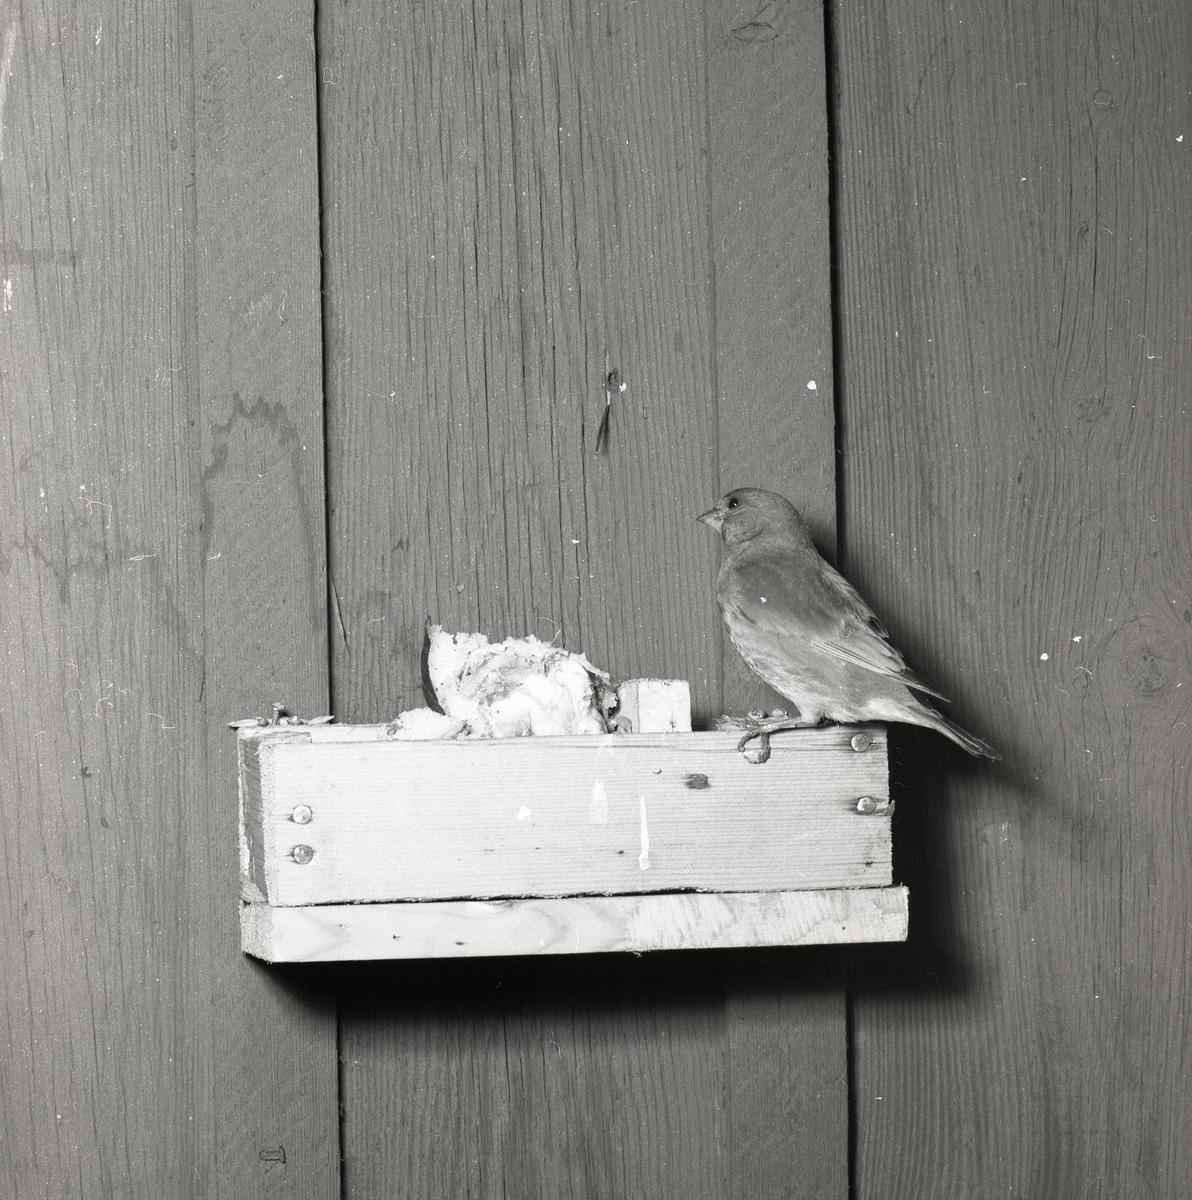 En grönfink sitter på kanten av en frölåda den 28 april 1956.